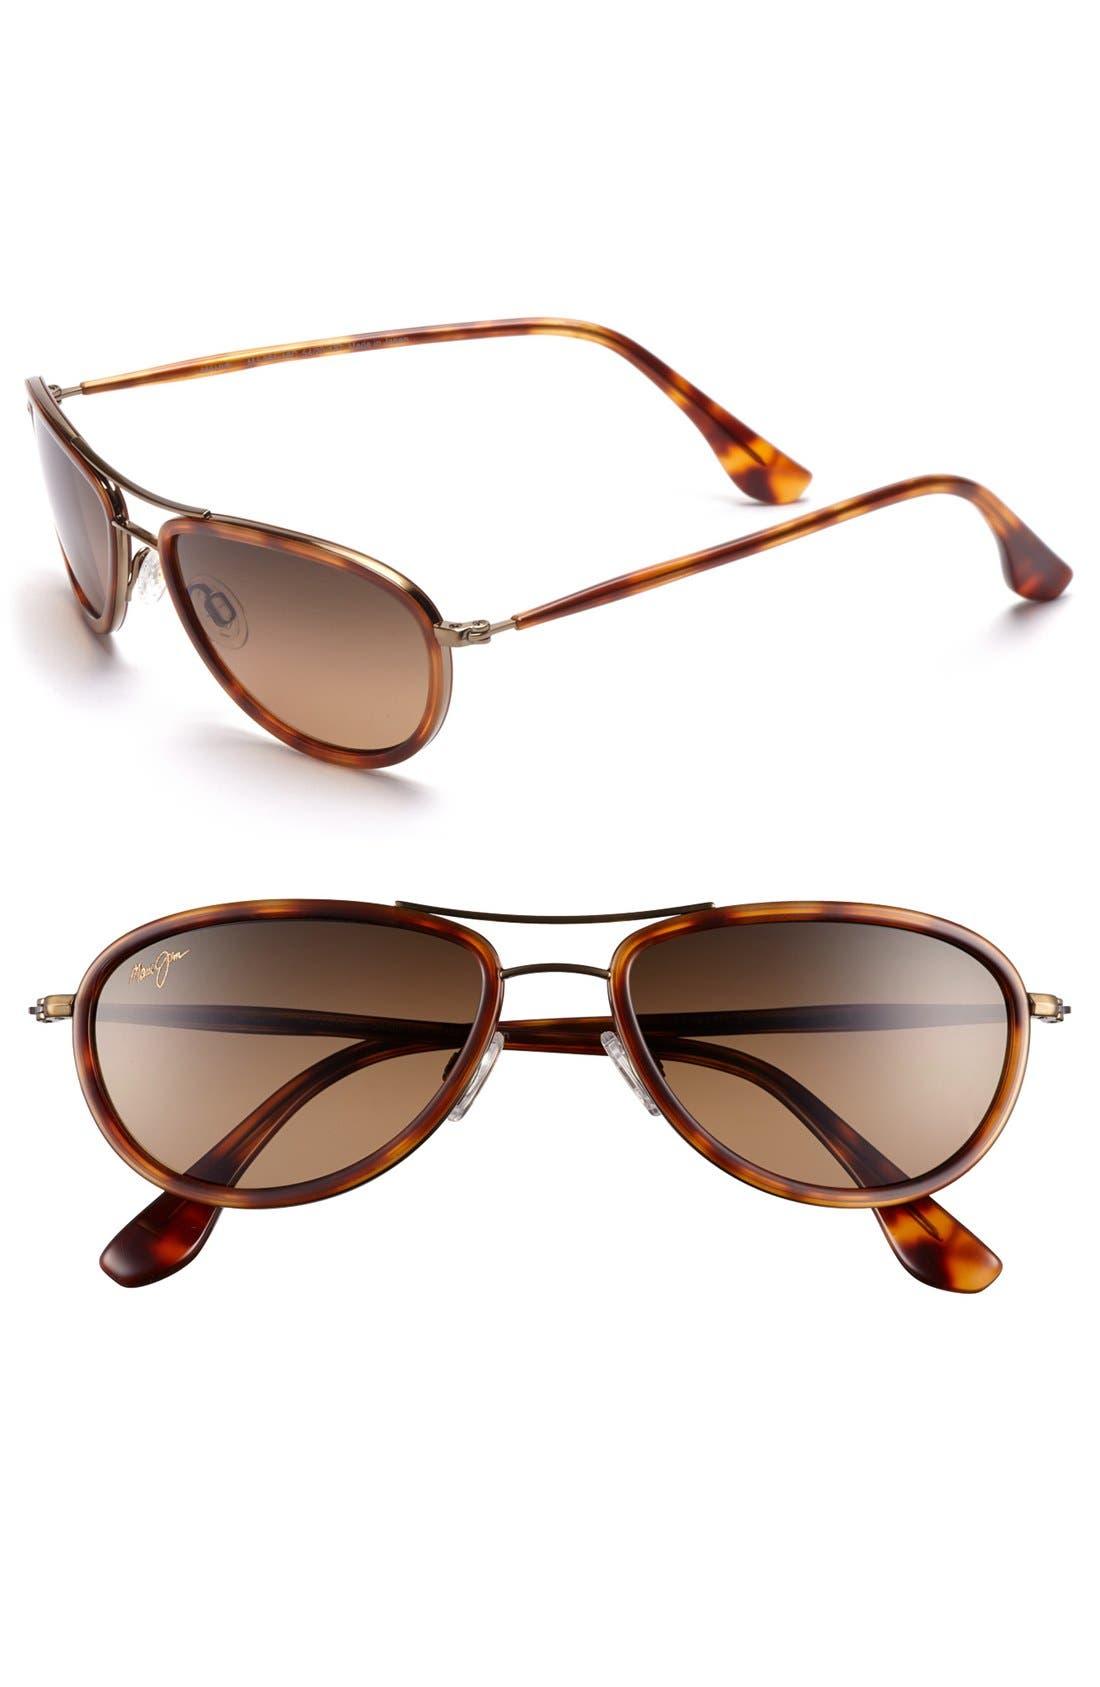 Alternate Image 1 Selected - Maui Jim 'Small - Kine' 54mm Sunglasses